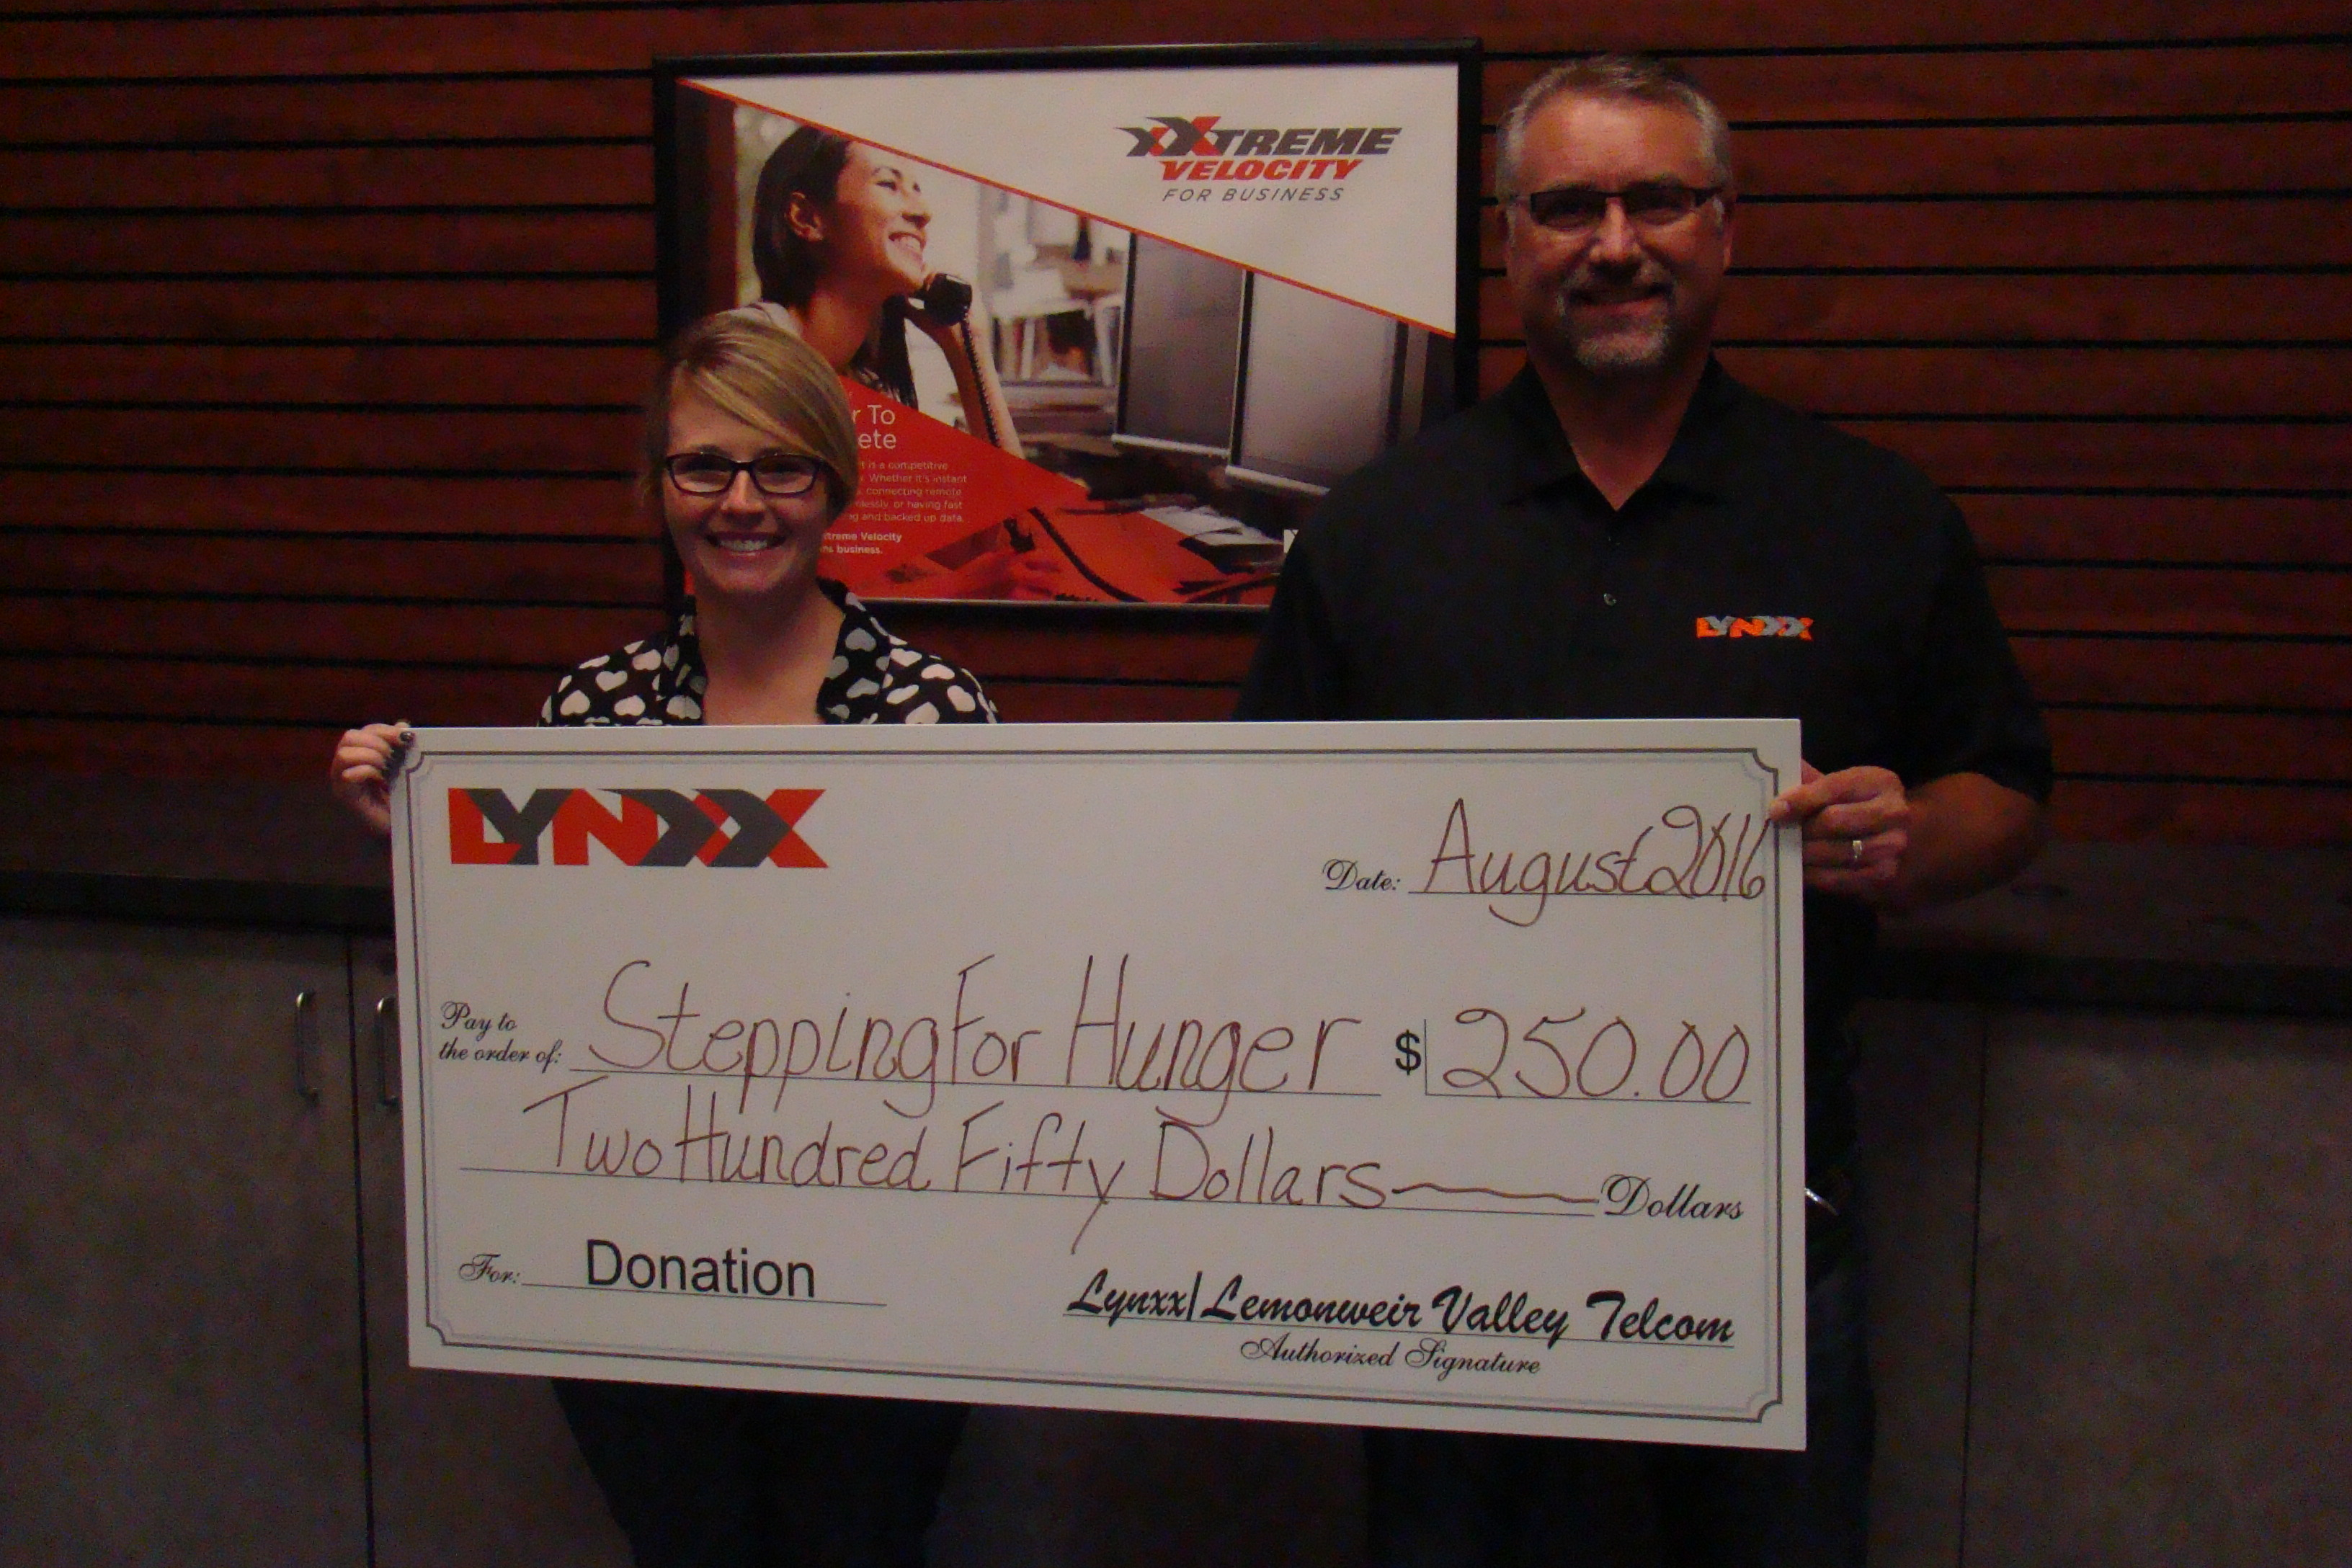 LYNXX Donates to 2016 Stepping For Hunger 5K RunWalk and 10K